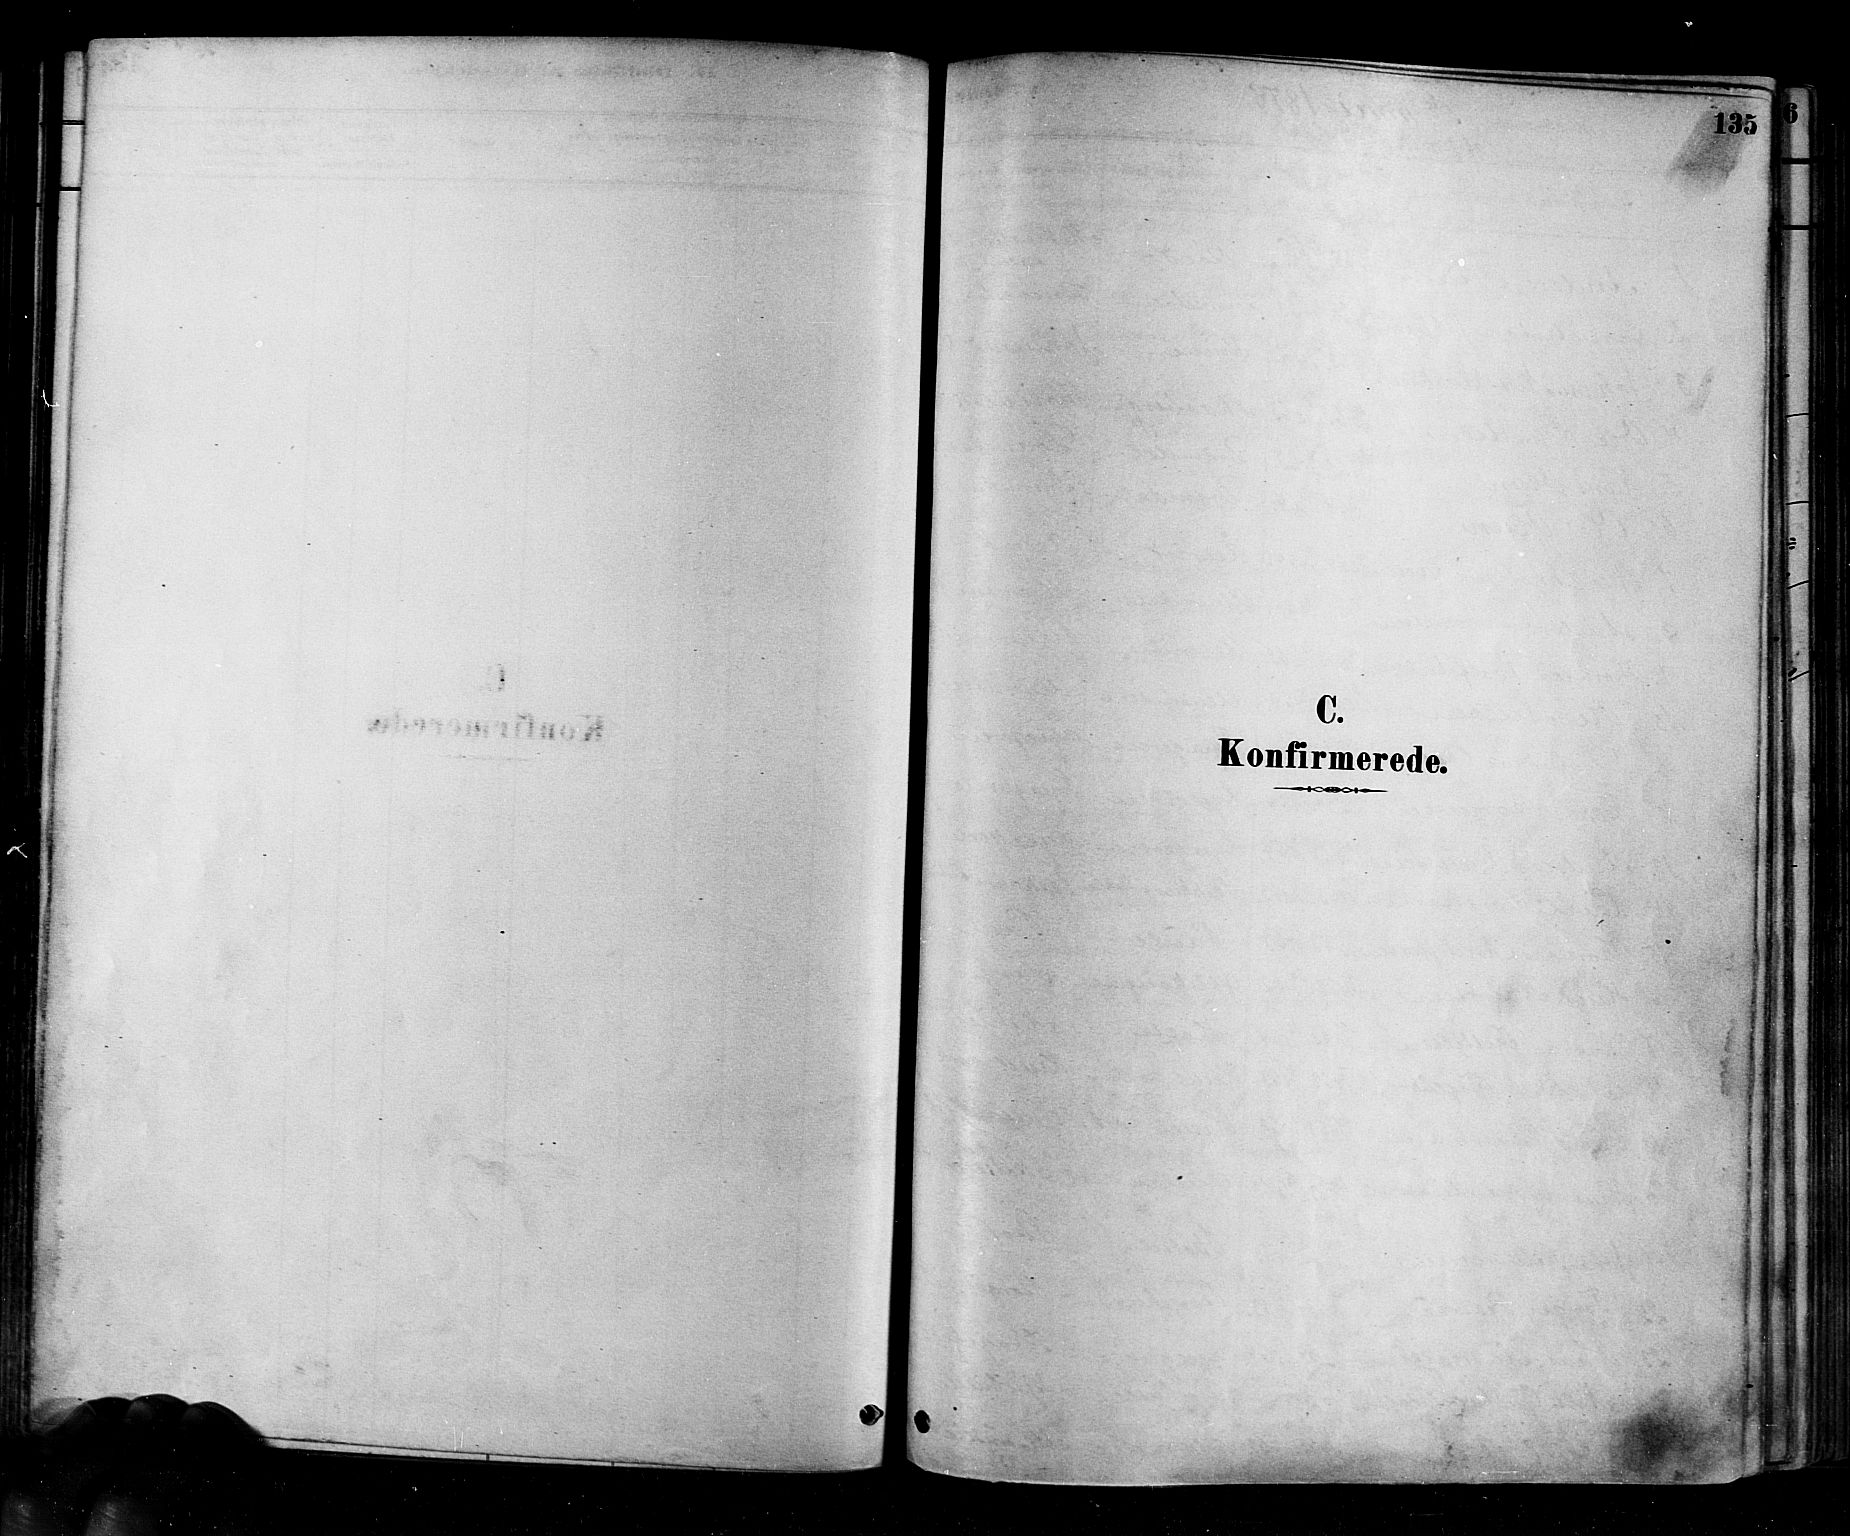 SAKO, Eiker kirkebøker, F/Fb/L0001: Ministerialbok nr. II 1, 1878-1888, s. 135